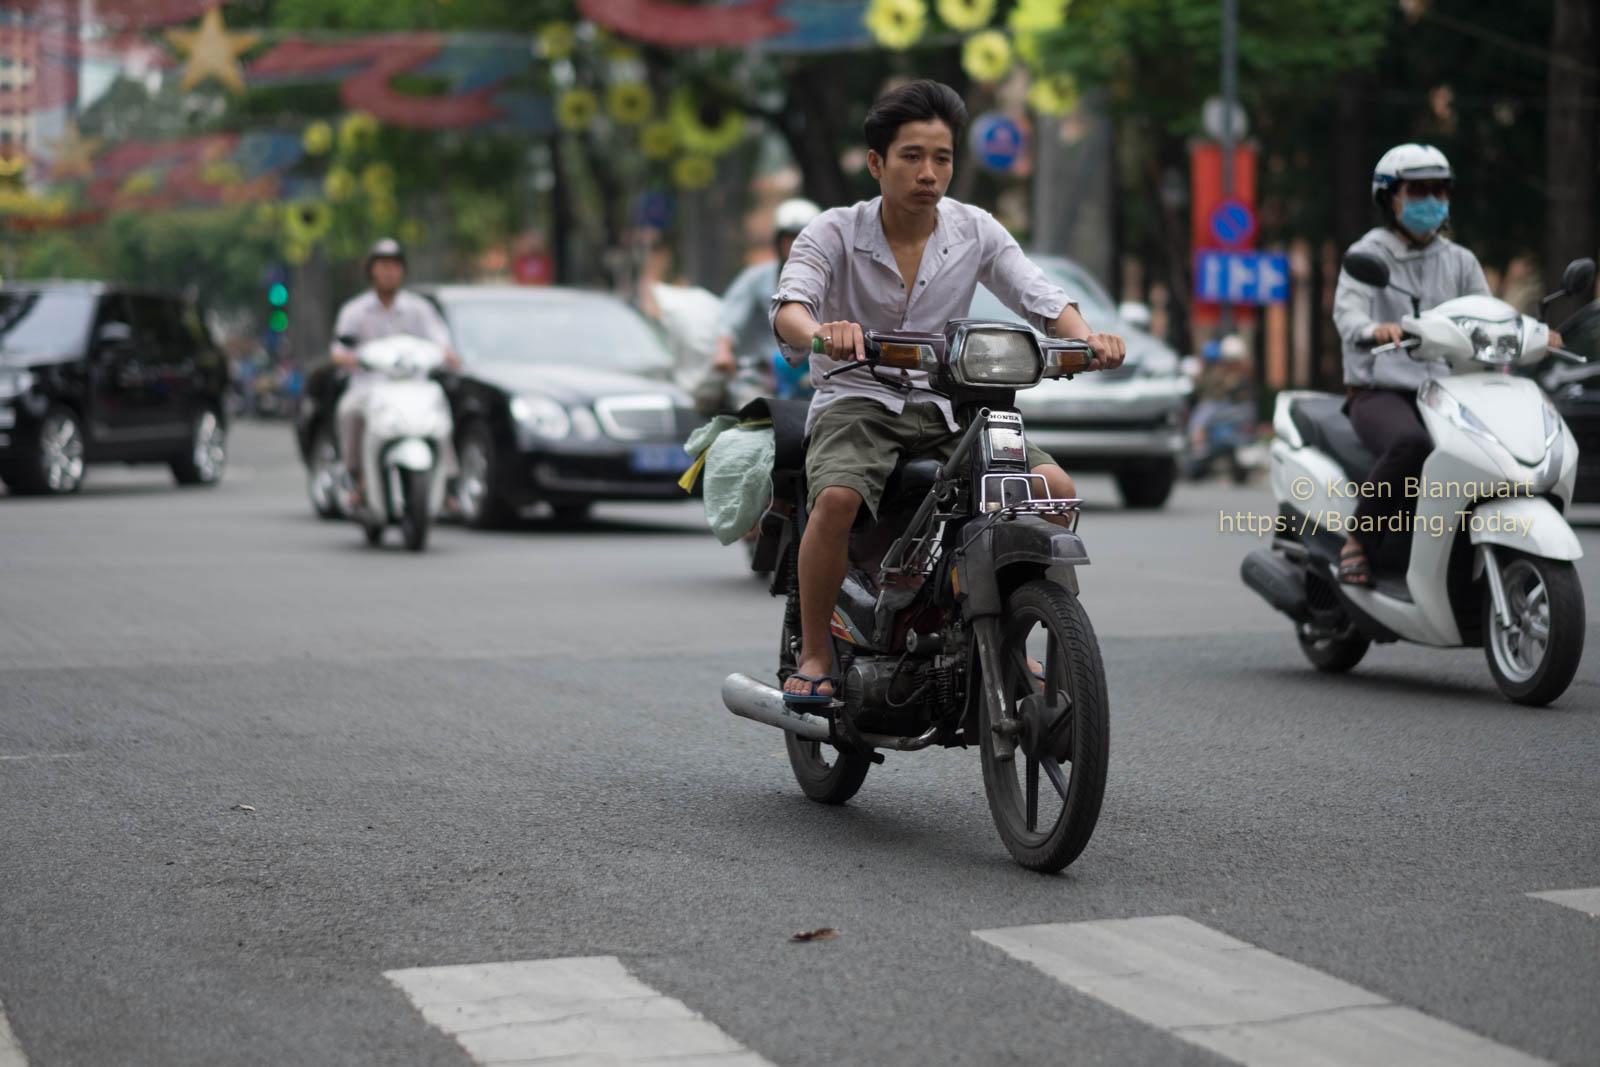 20170120-DSCF5461Ho Chi Minh City, Saigon, Saigon_Food_Tour, Vietnam by Koen Blanquart for Boarding.Today.jpg